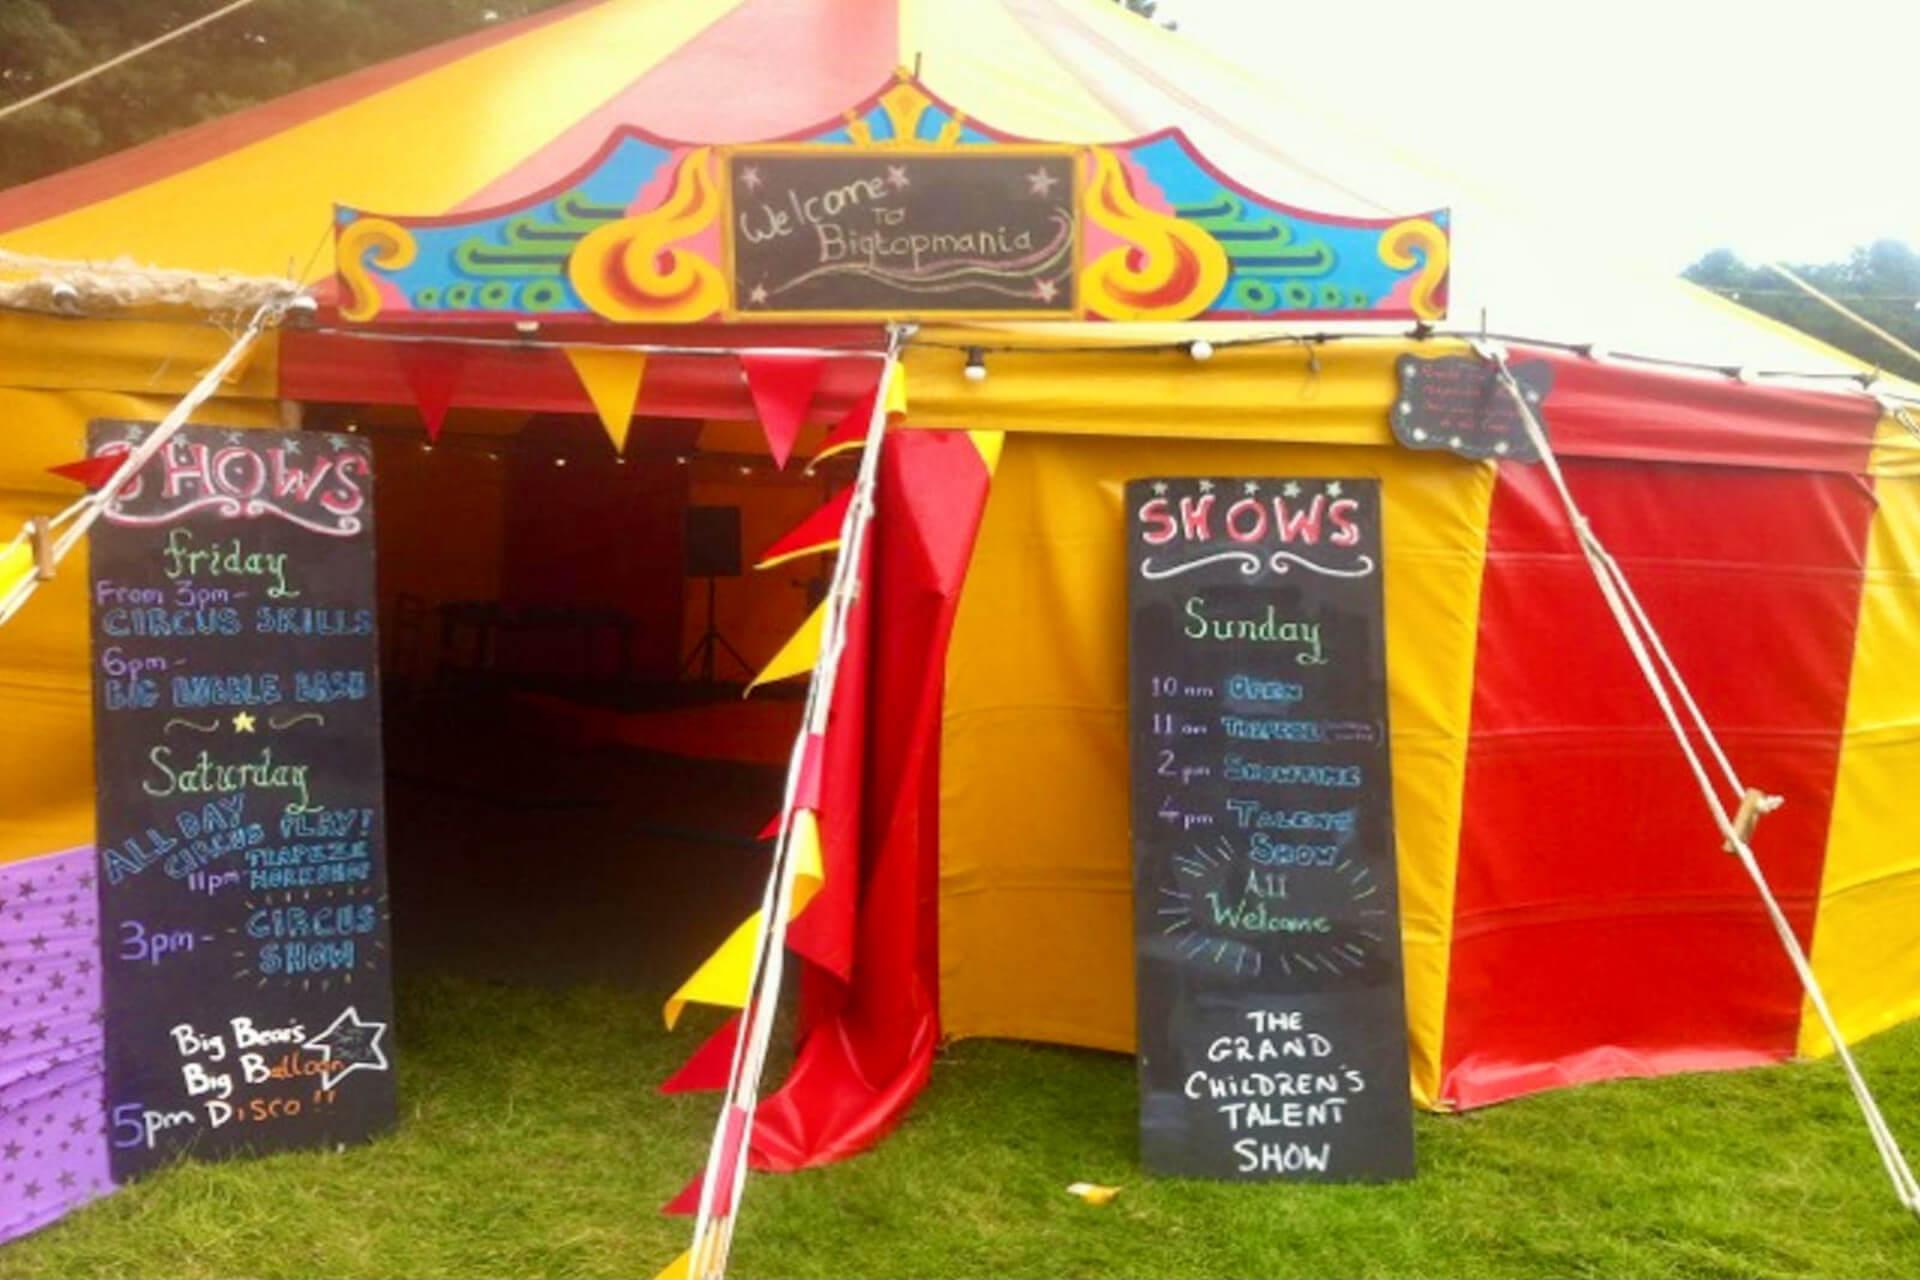 Small childrens show tent at festival Devon